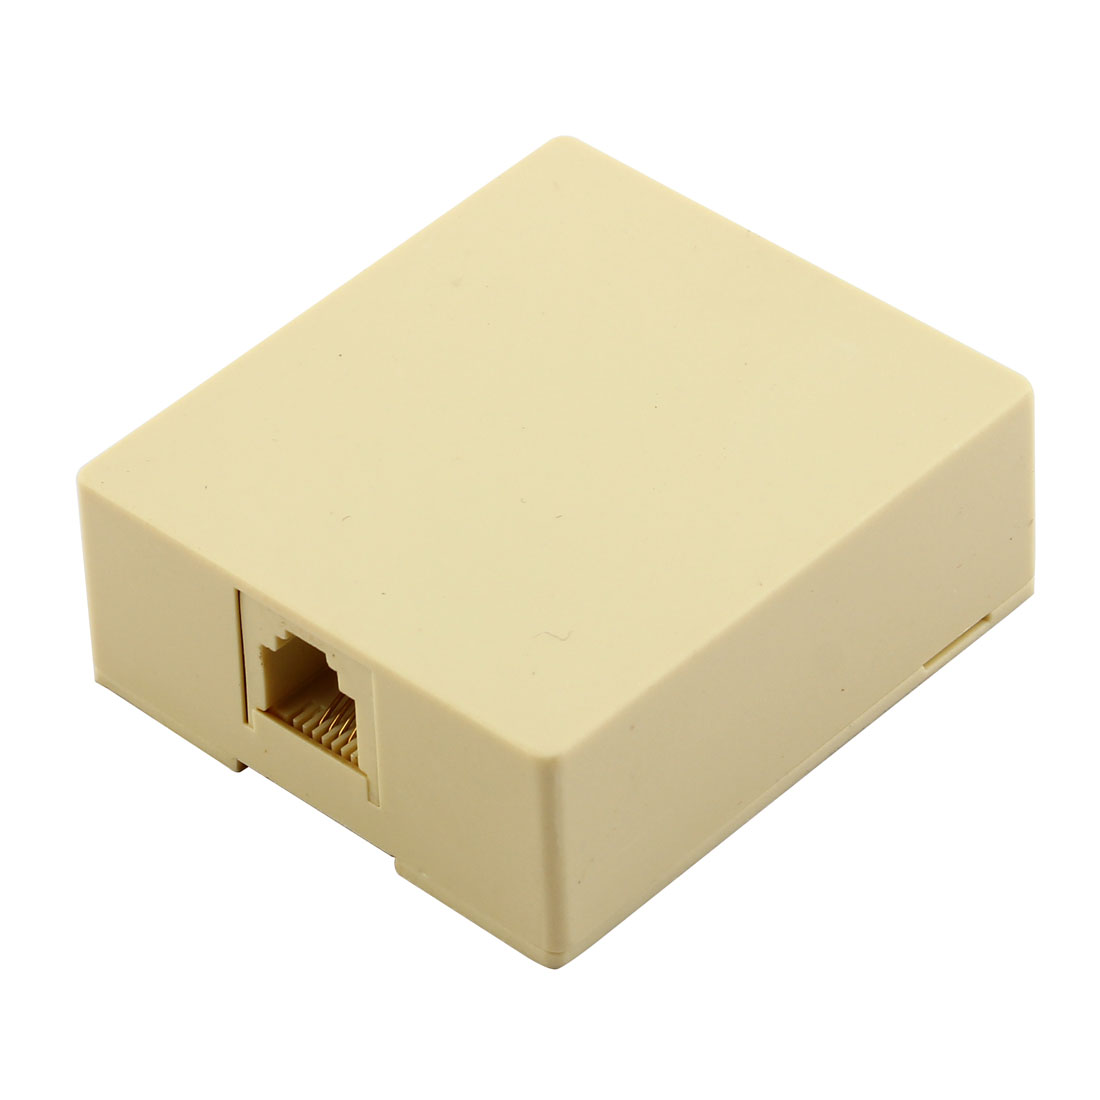 4 Pin RJ11 Socket Surface Mount Telephone Cable Jack Box